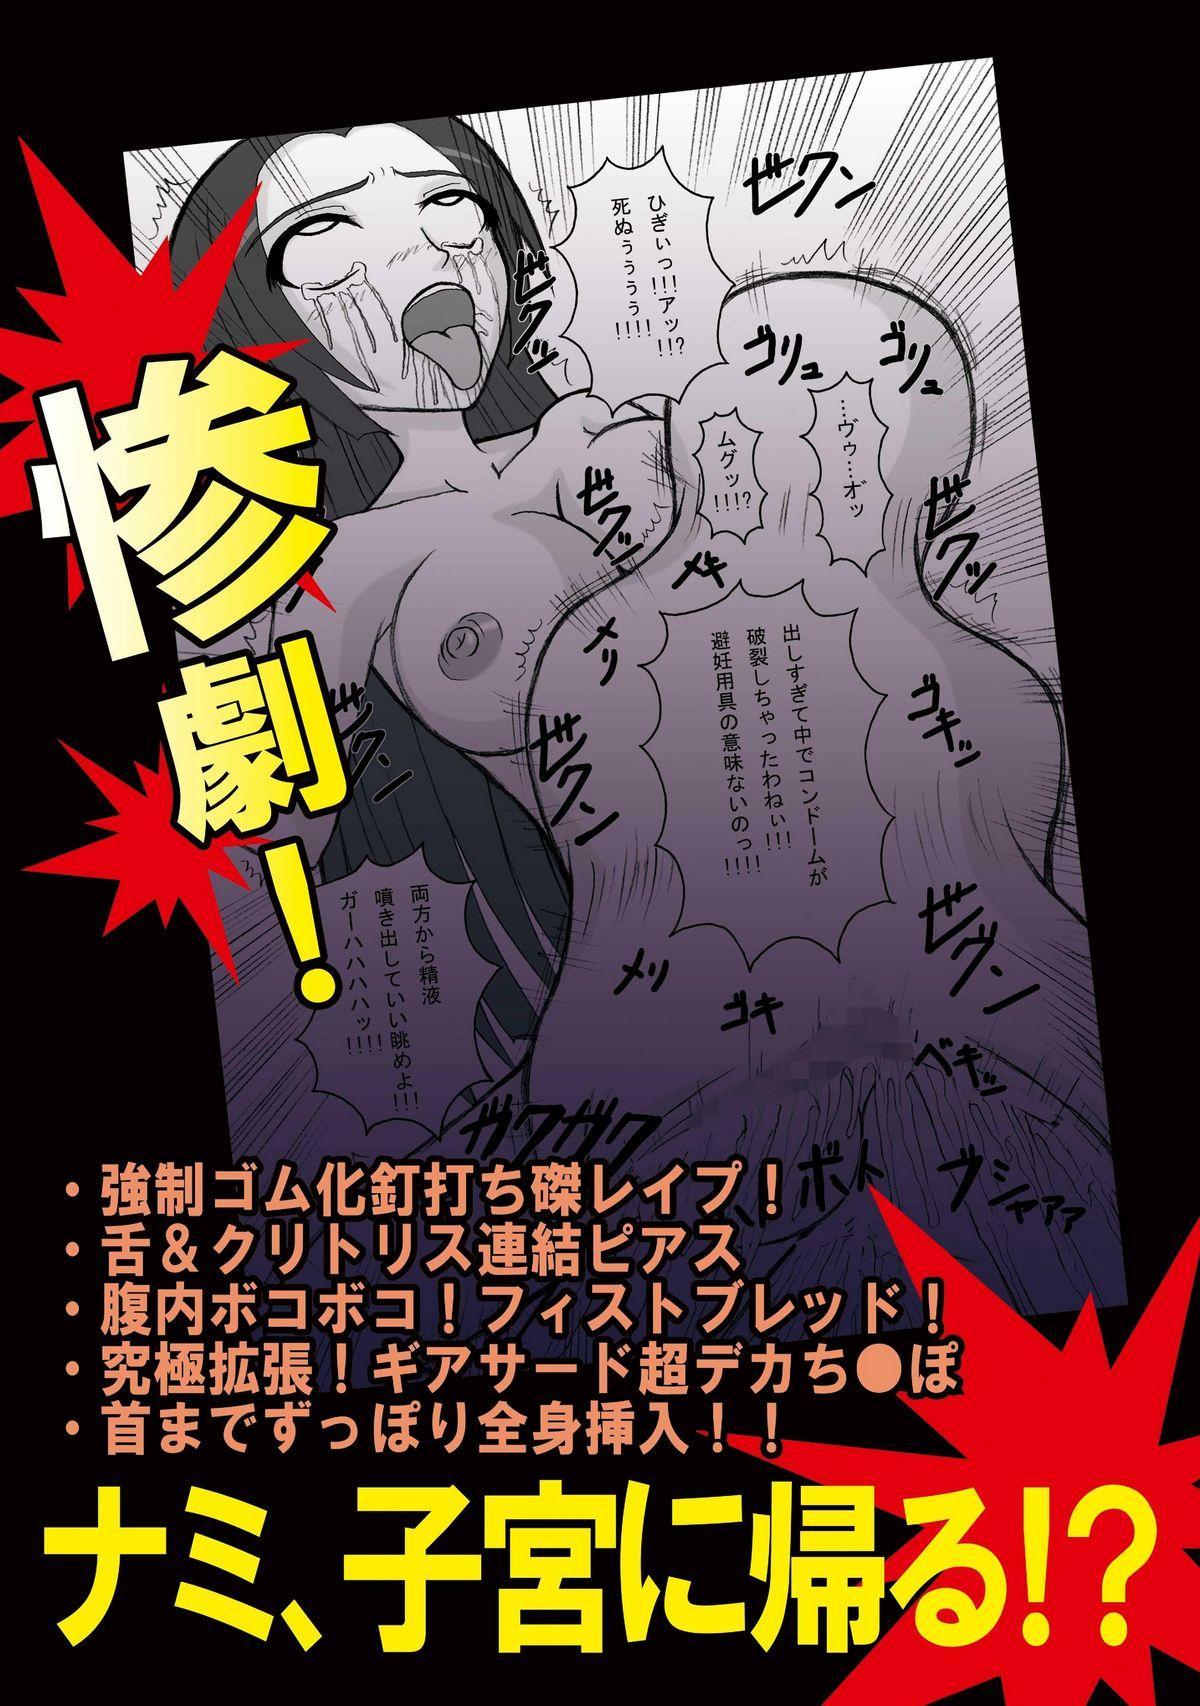 Jump Tales 5 San P Nami Baku More Condom Nami vs Gear3 vs Marunomi Hebihime 25